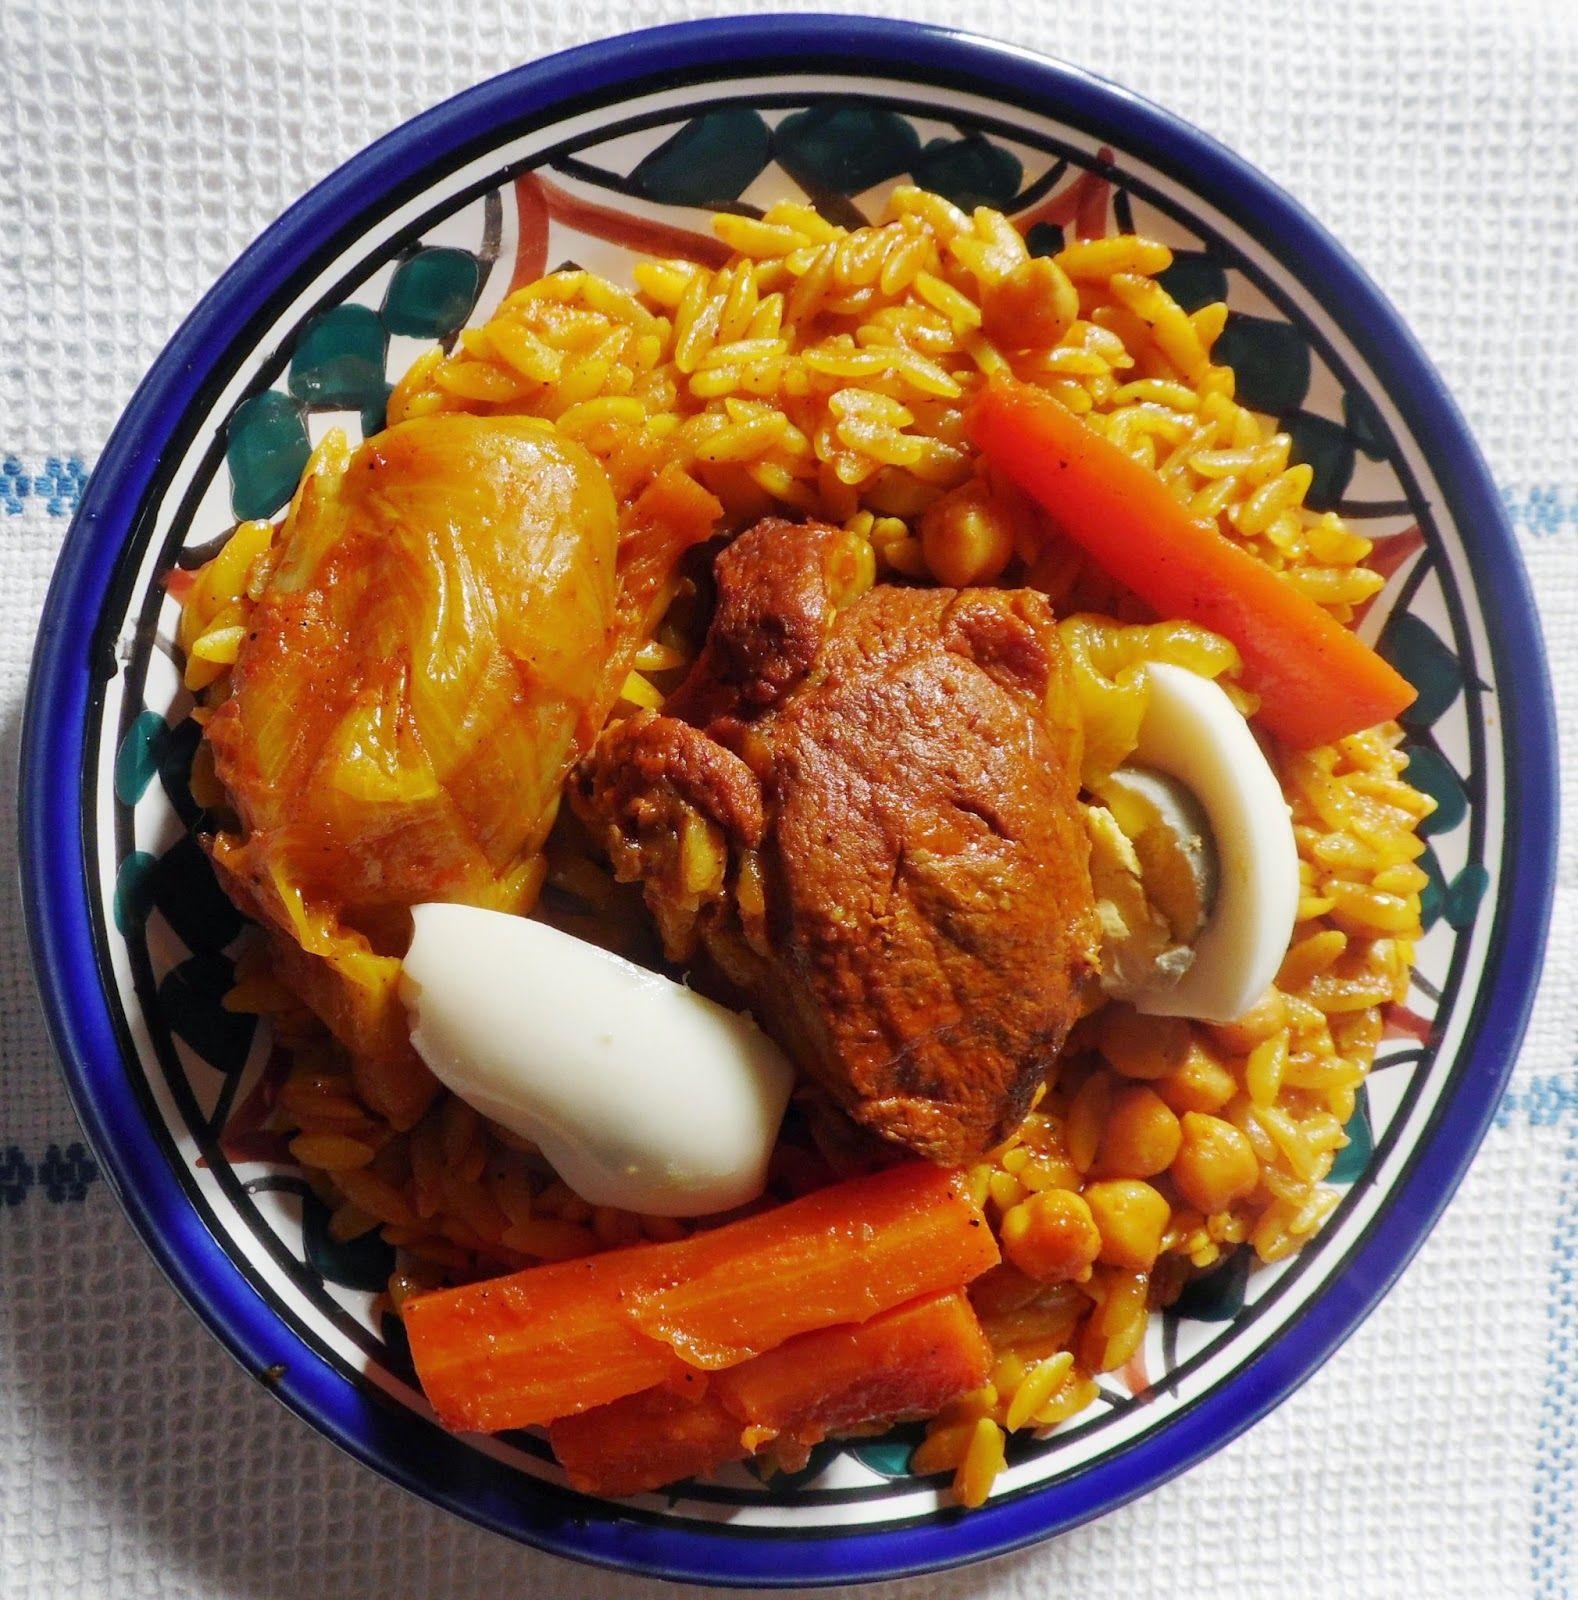 Les d lices de la tunisie les viandes tunisian food - Tastira cuisine tunisienne ...